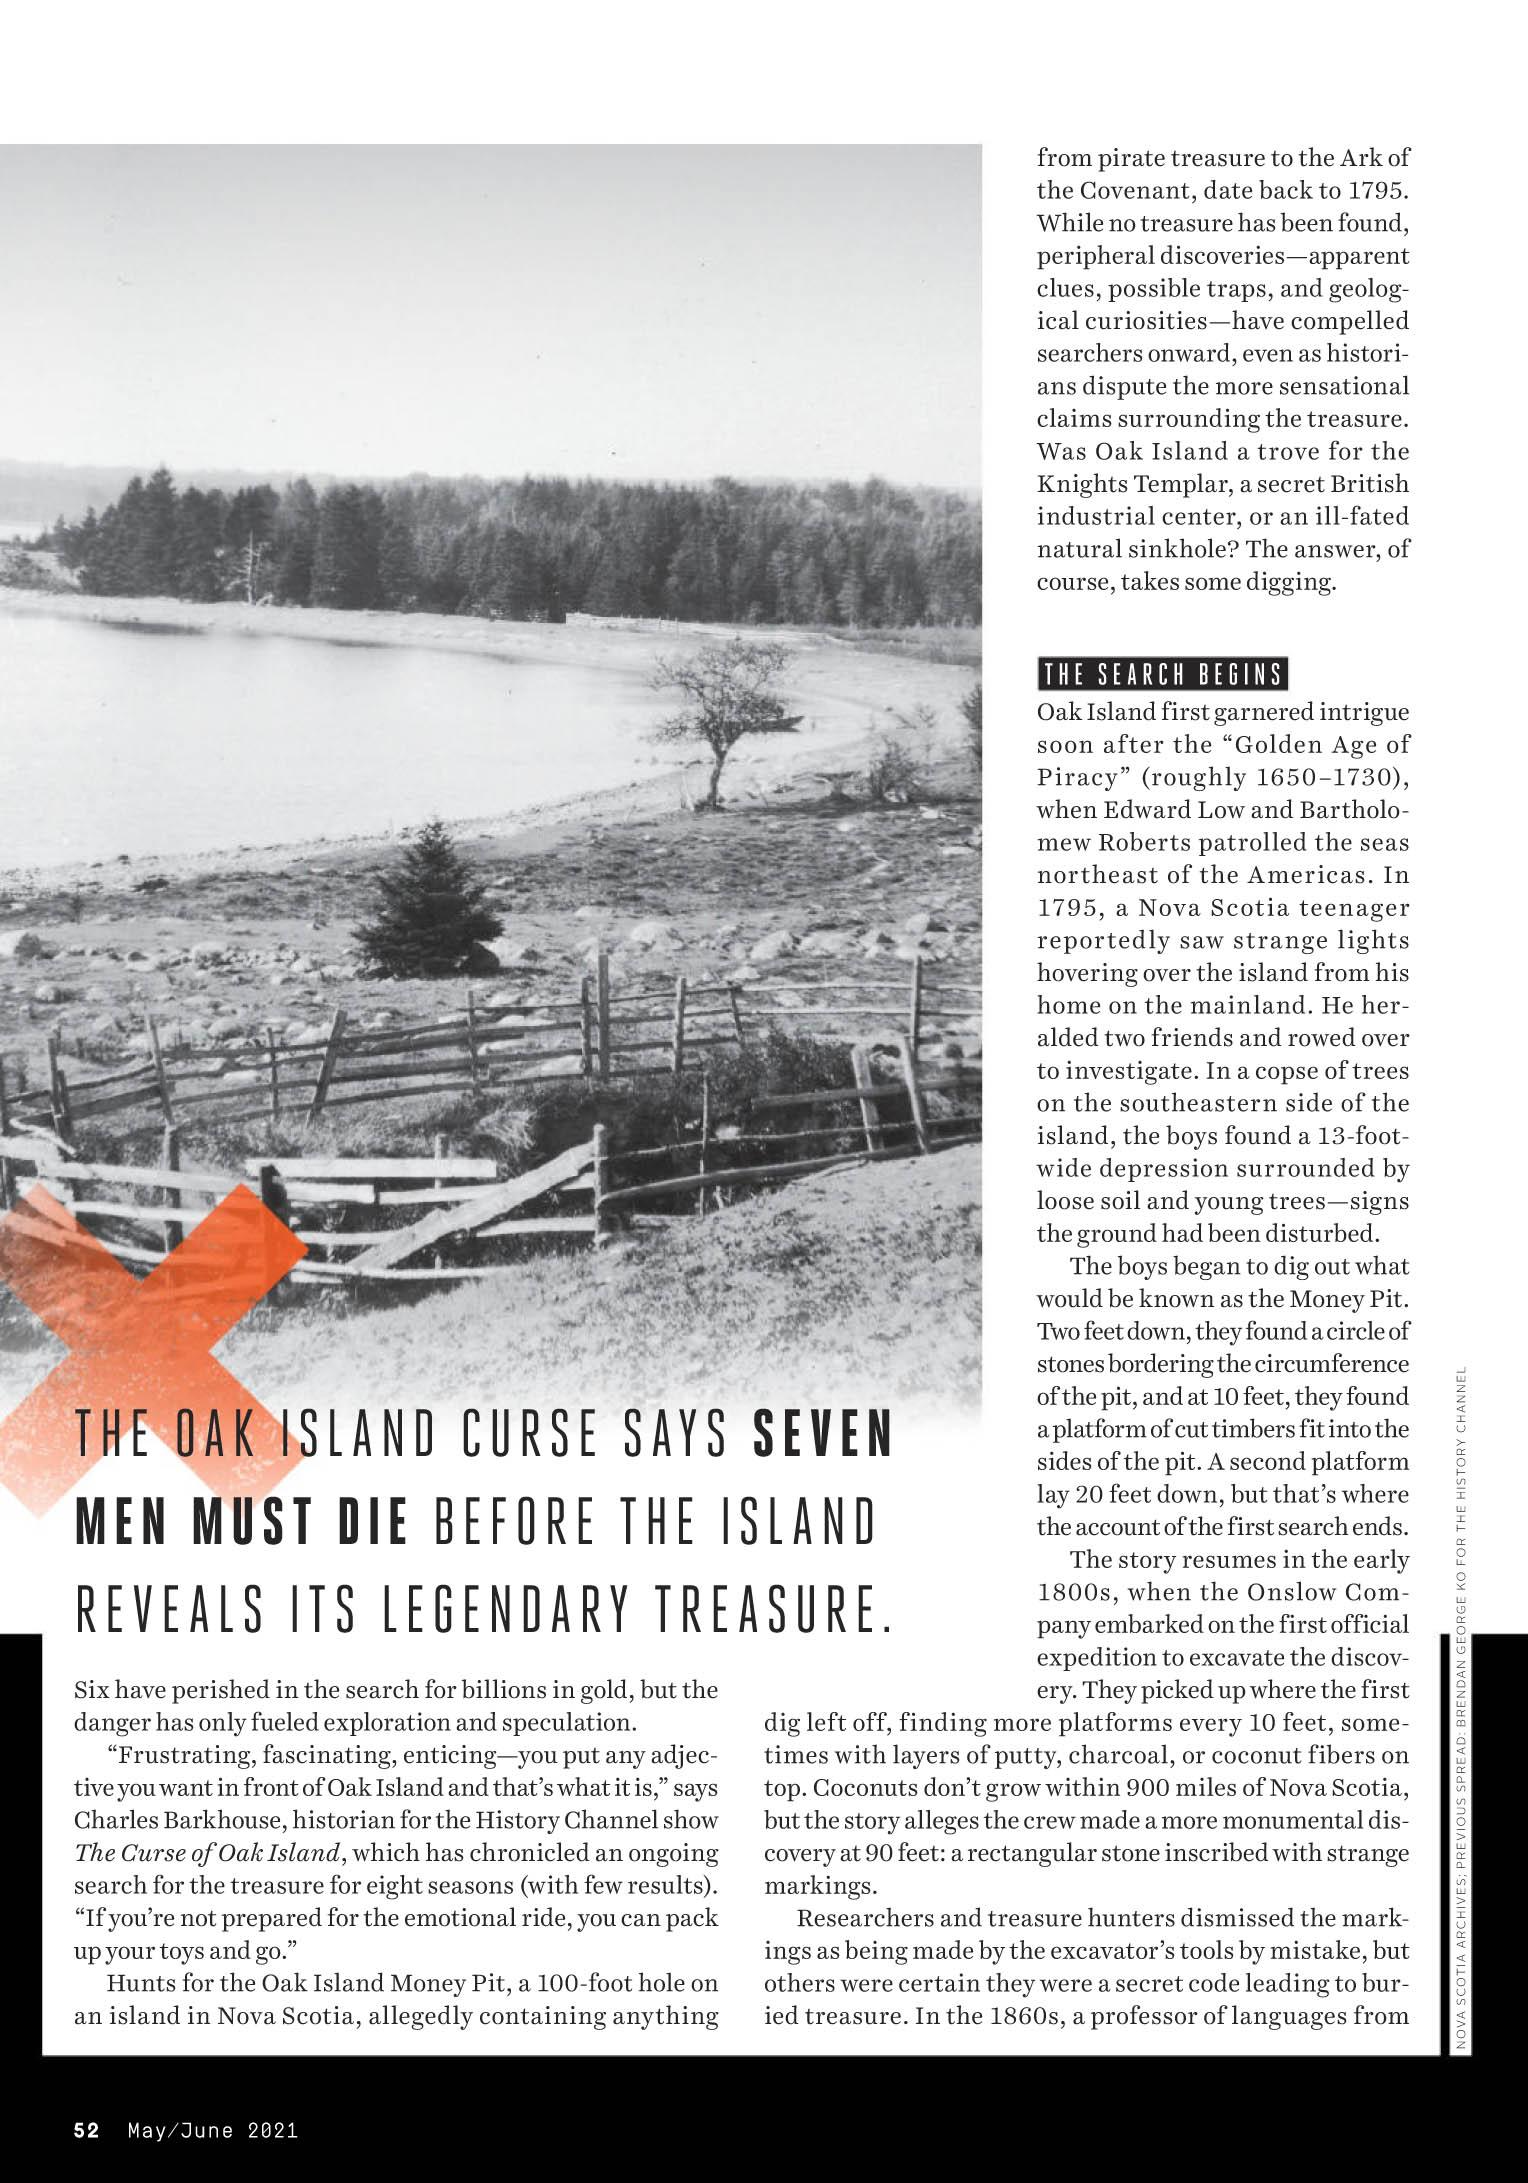 Popular Mechanics 2021-05-06 Oak Island 02.jpg